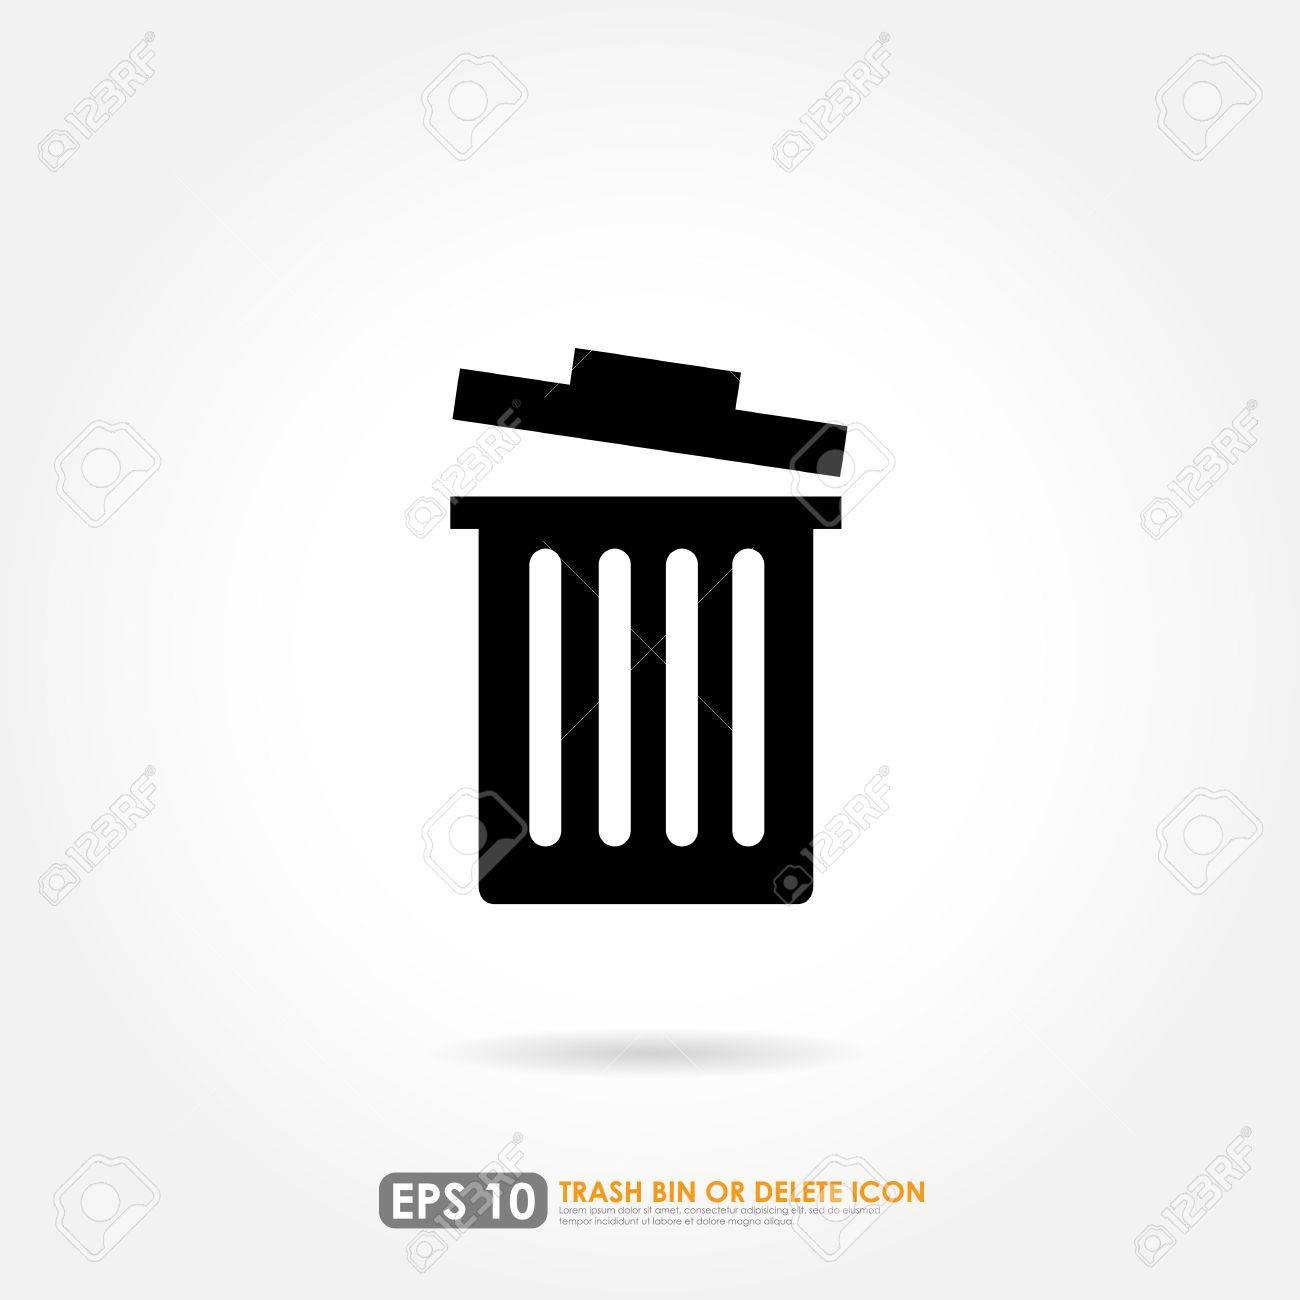 Black Trash Bin Or Delete Icon On White Background Royalty Free ...